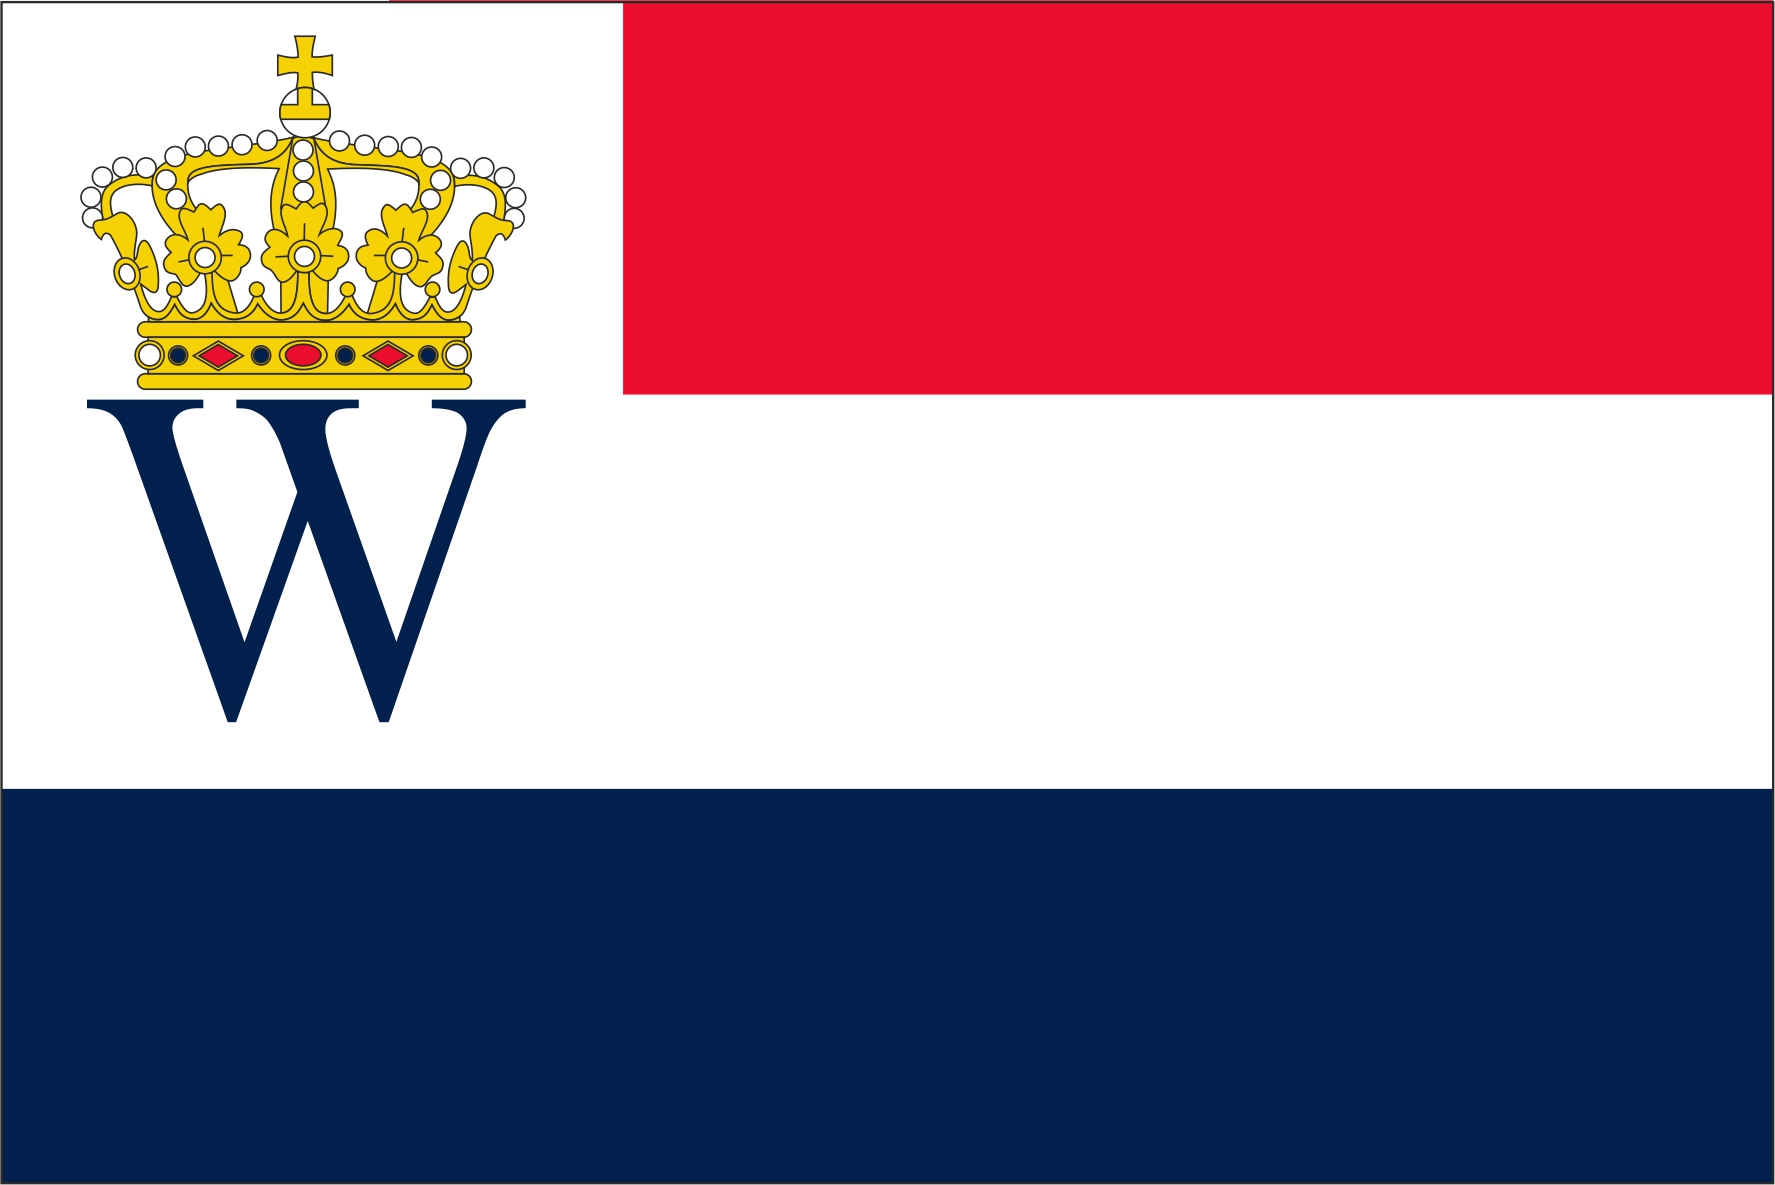 Koninklijke Watersport Vlag 50x75cm